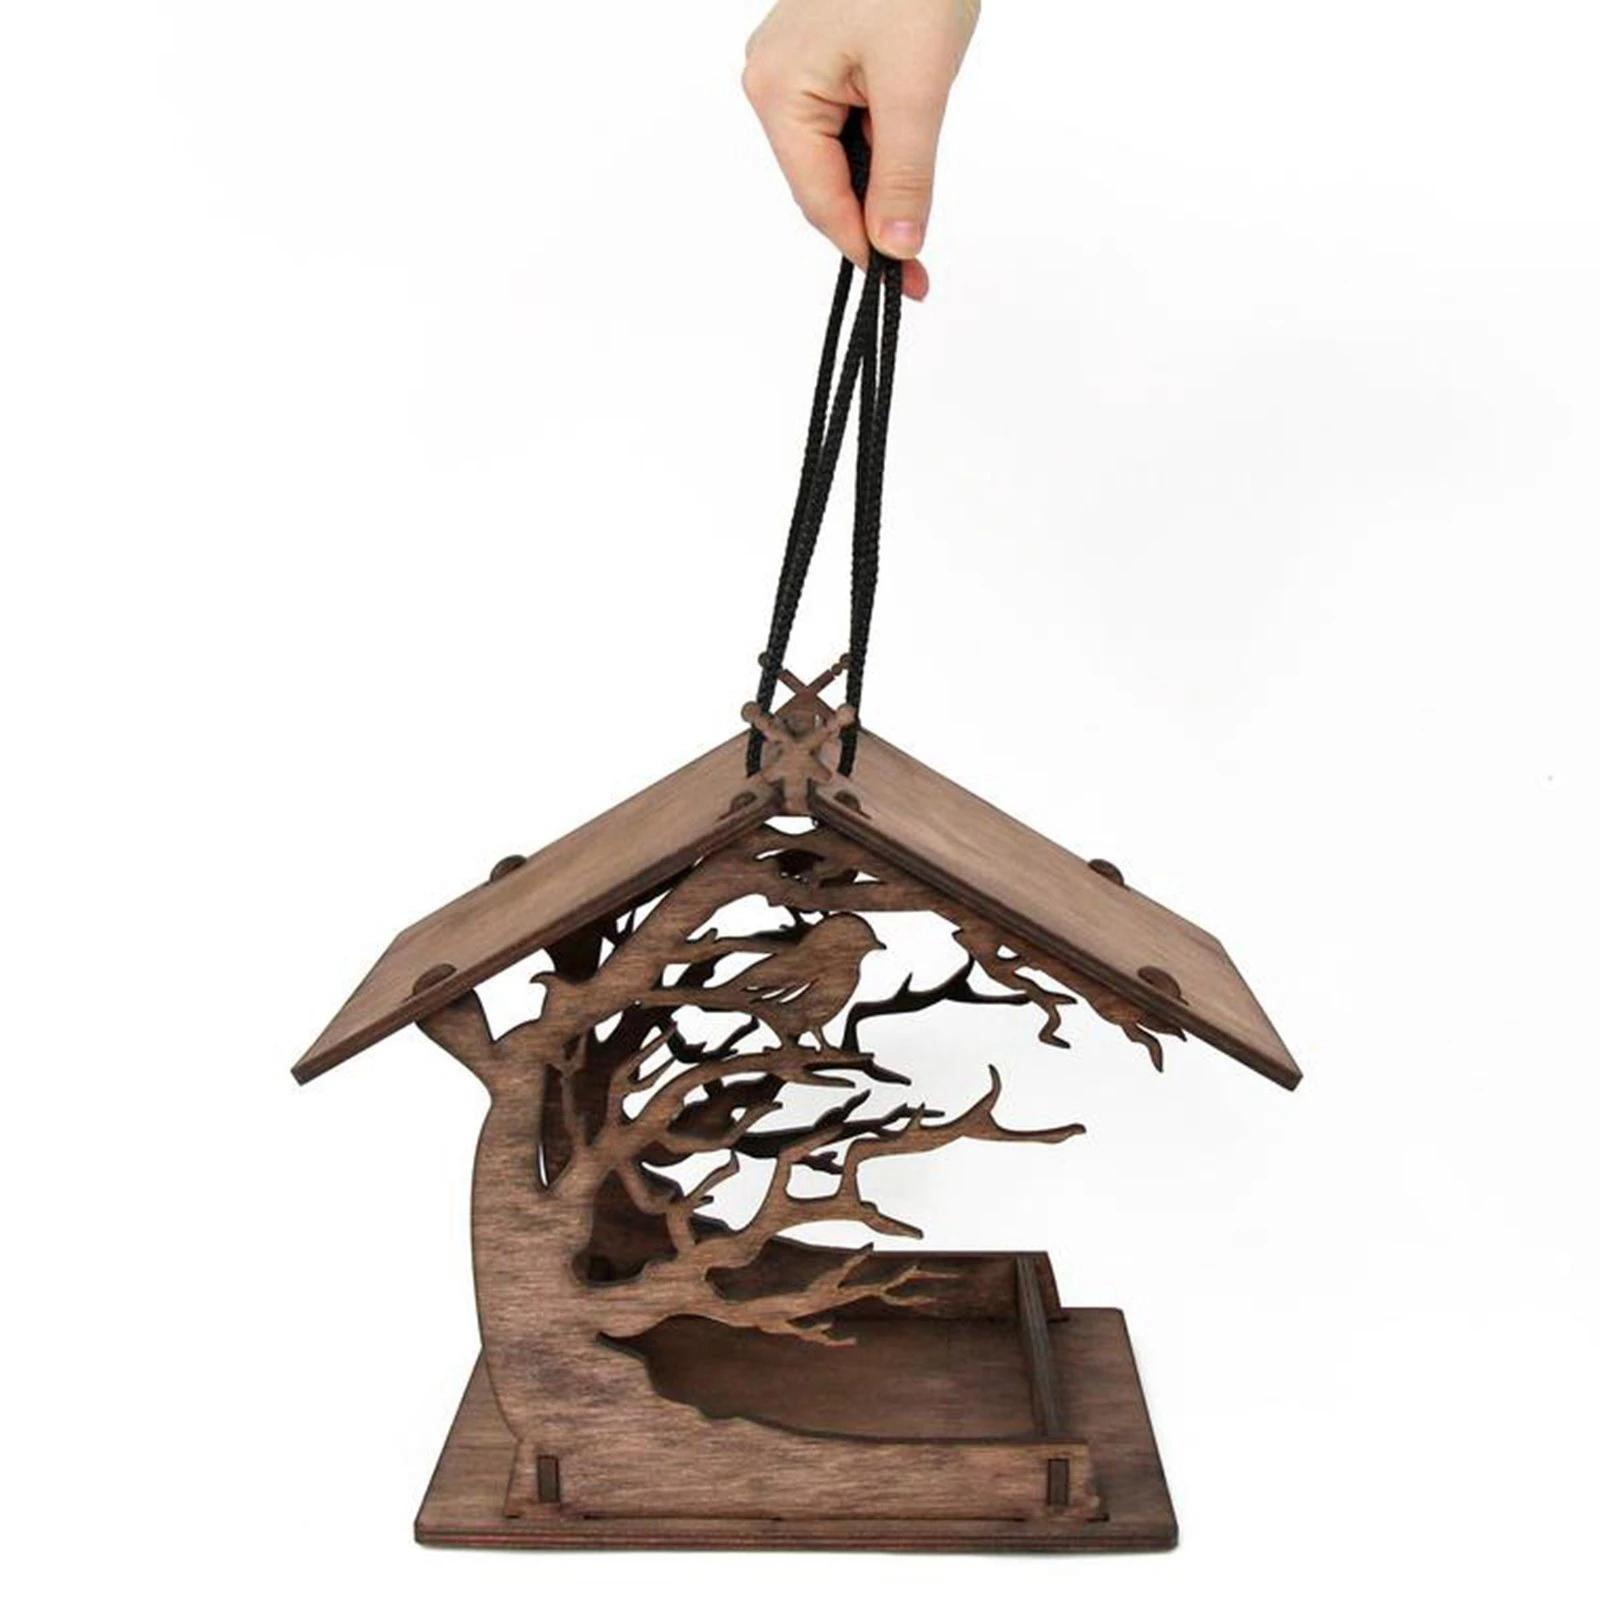 thumbnail 5 - Wooden Bird Feeder Balcony Ranch Decoration Ornaments Wildbird Essentials